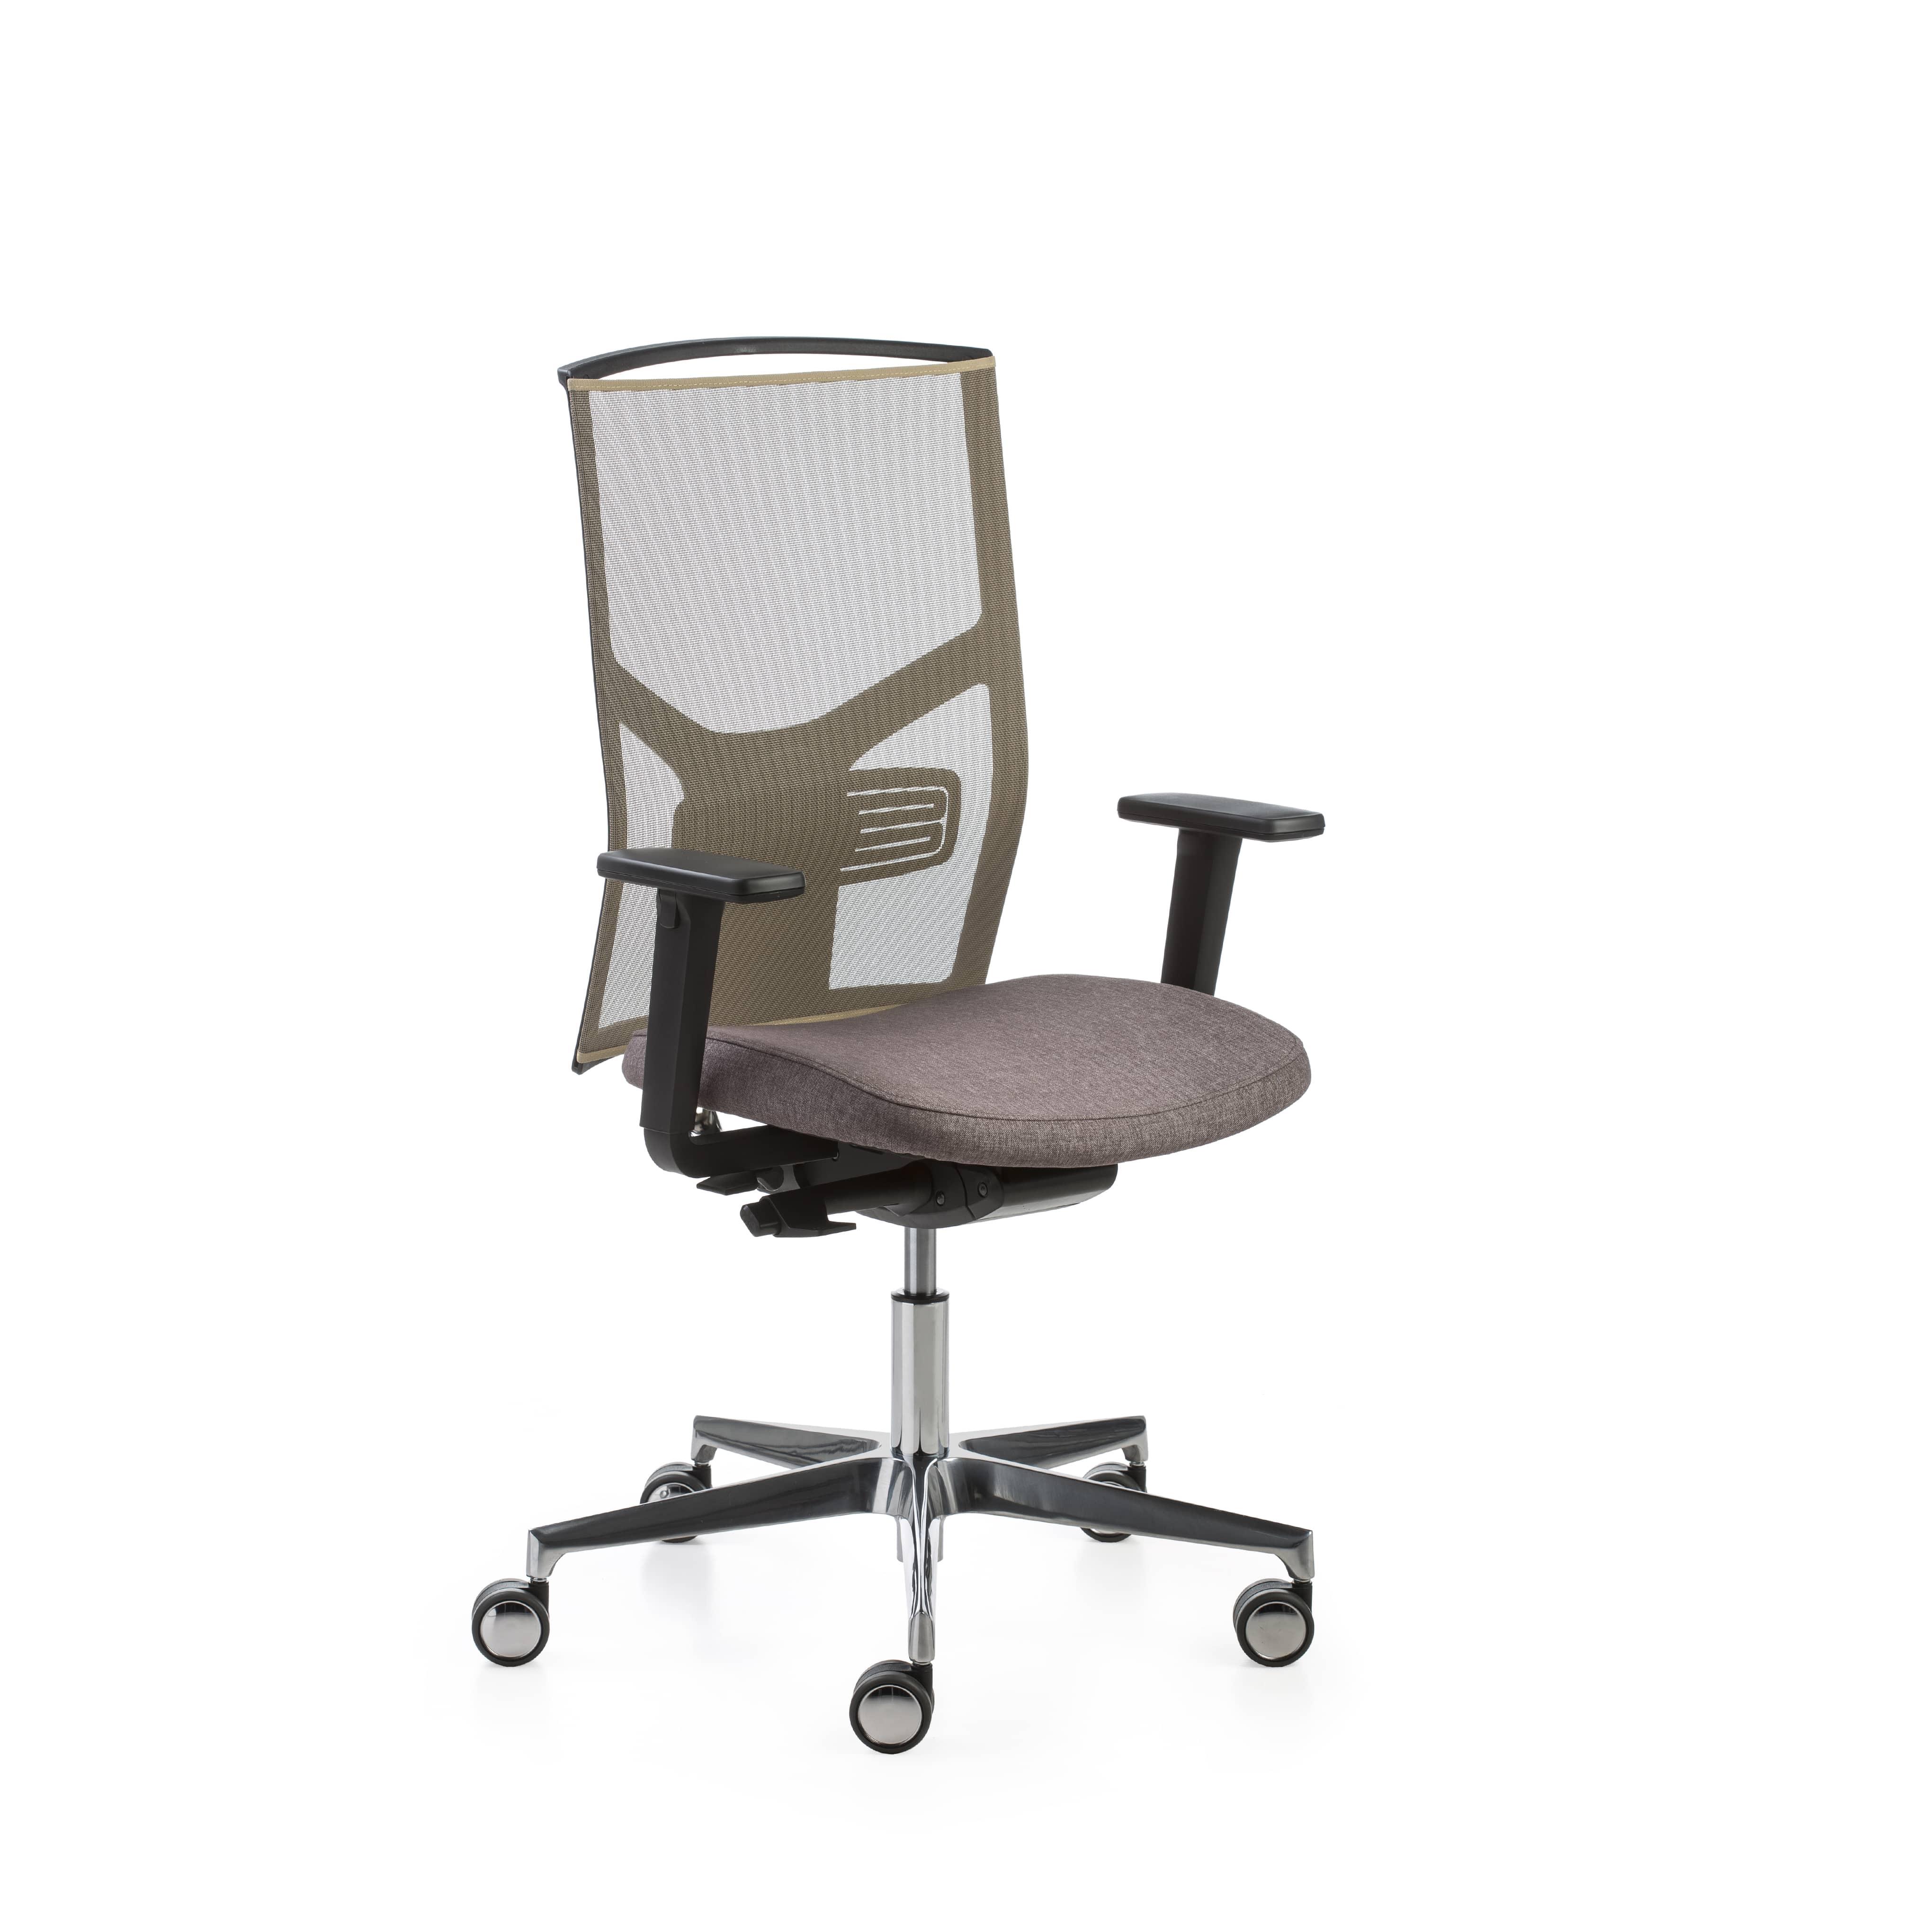 sillas-oficina-General-muebles-paco-caballero-454-5caf5d9034b07